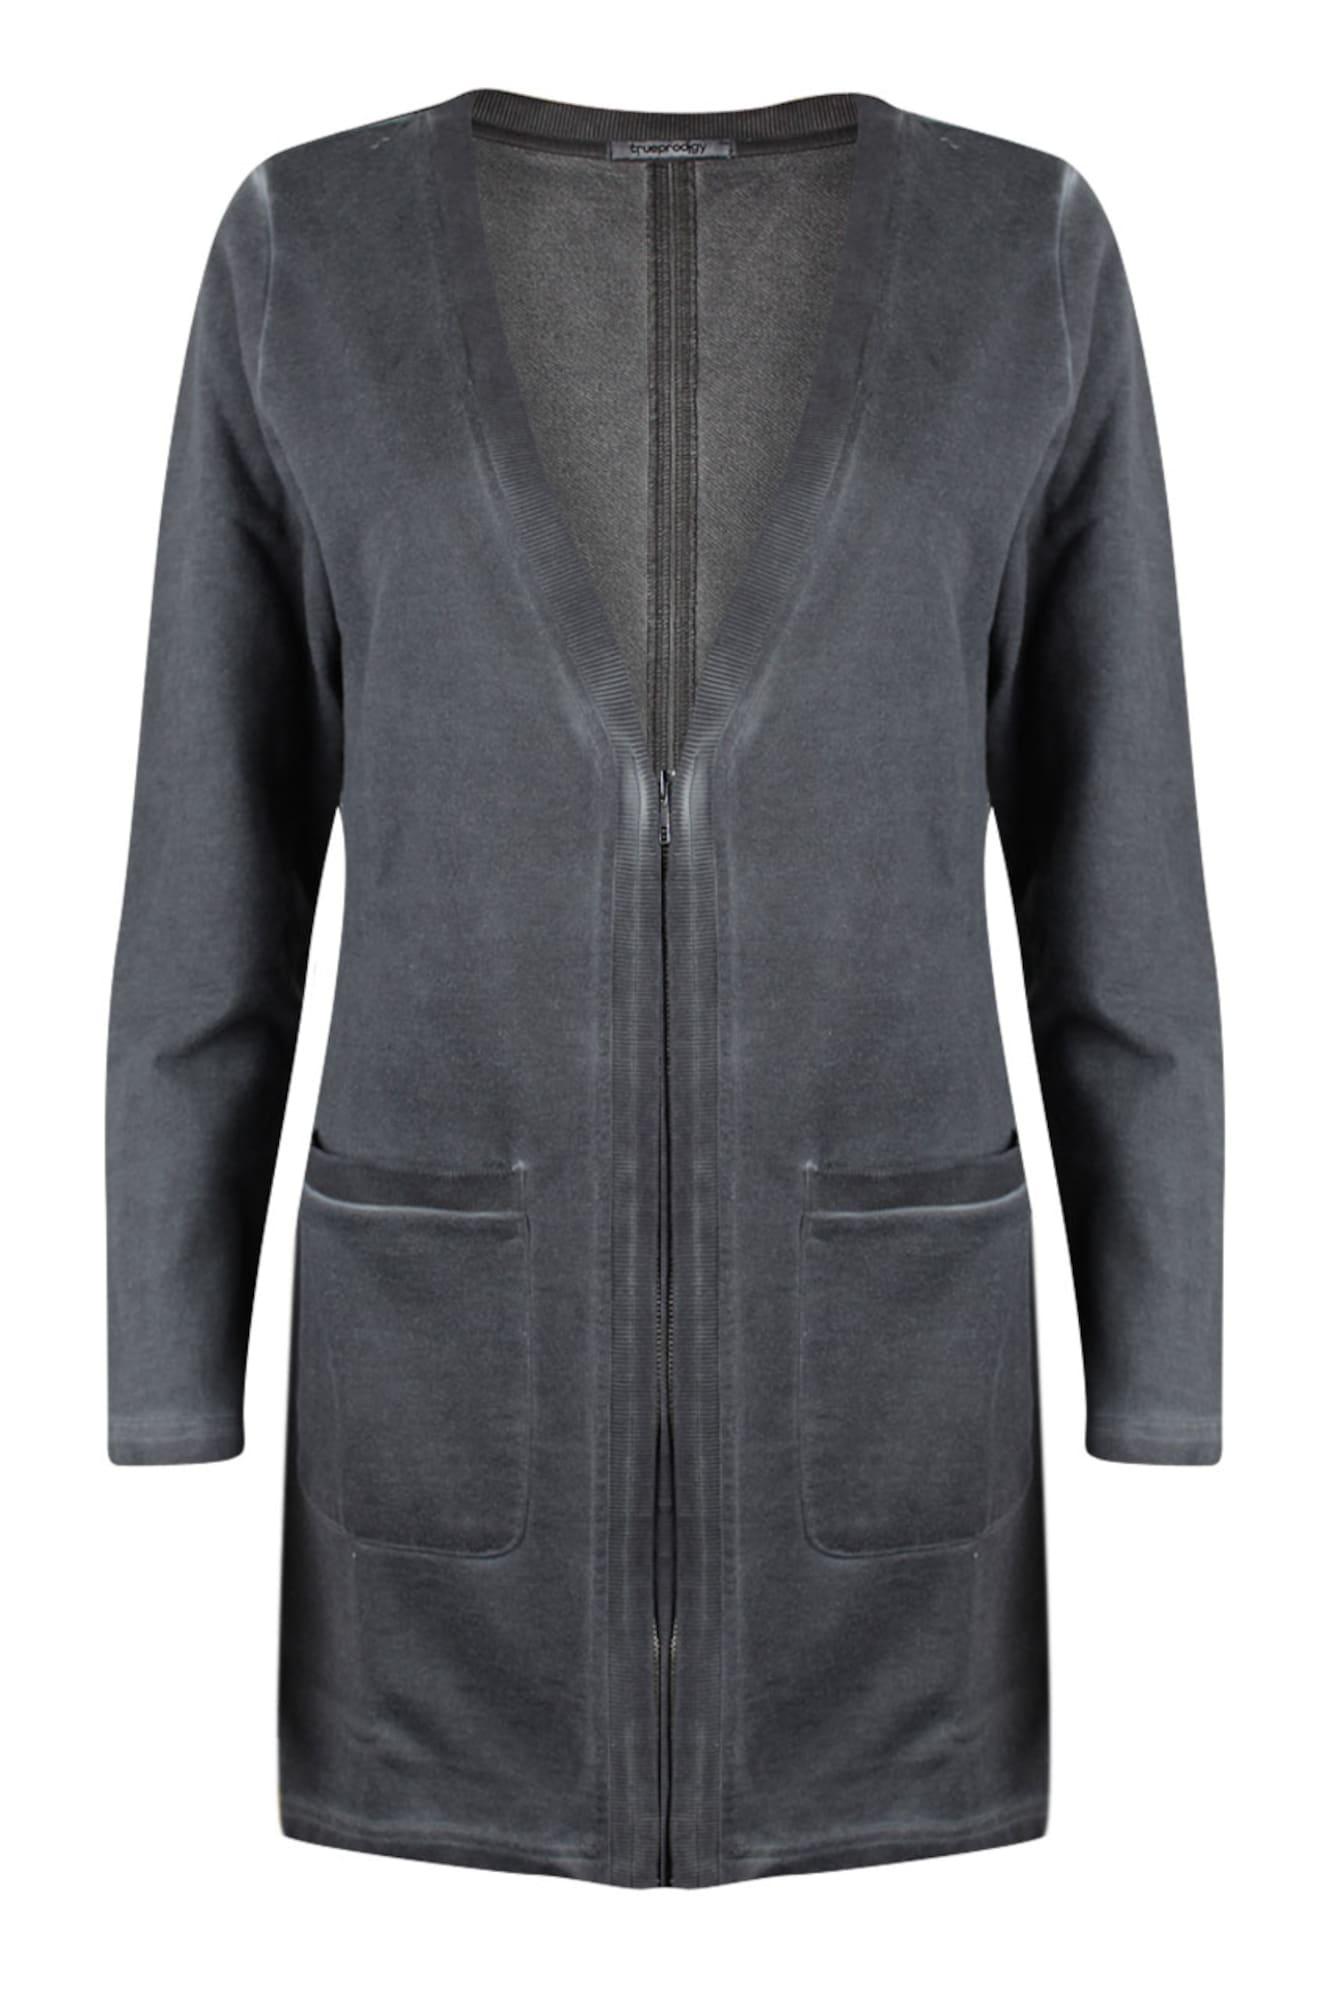 Sweatjacke 'Lori' | Bekleidung > Sweatshirts & -jacken > Sweatjacken | Dunkelgrau | Trueprodigy